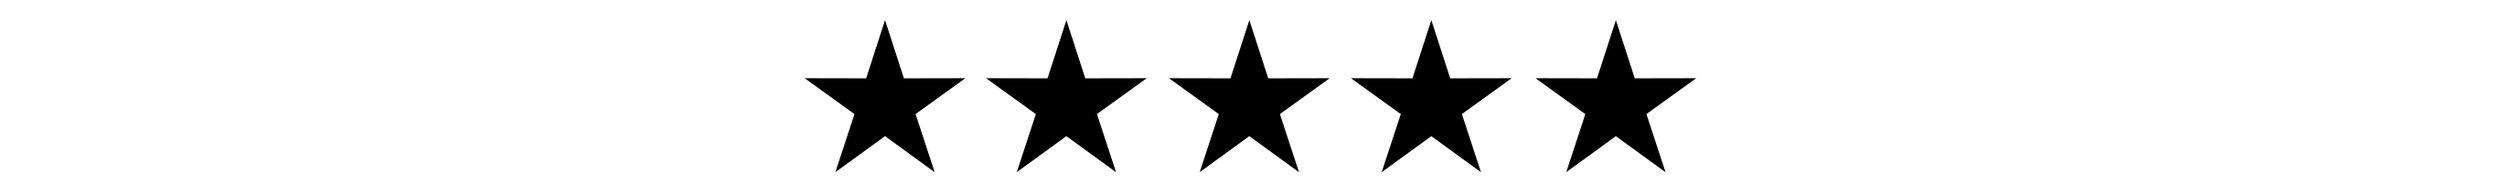 5 Stars 0001.jpg